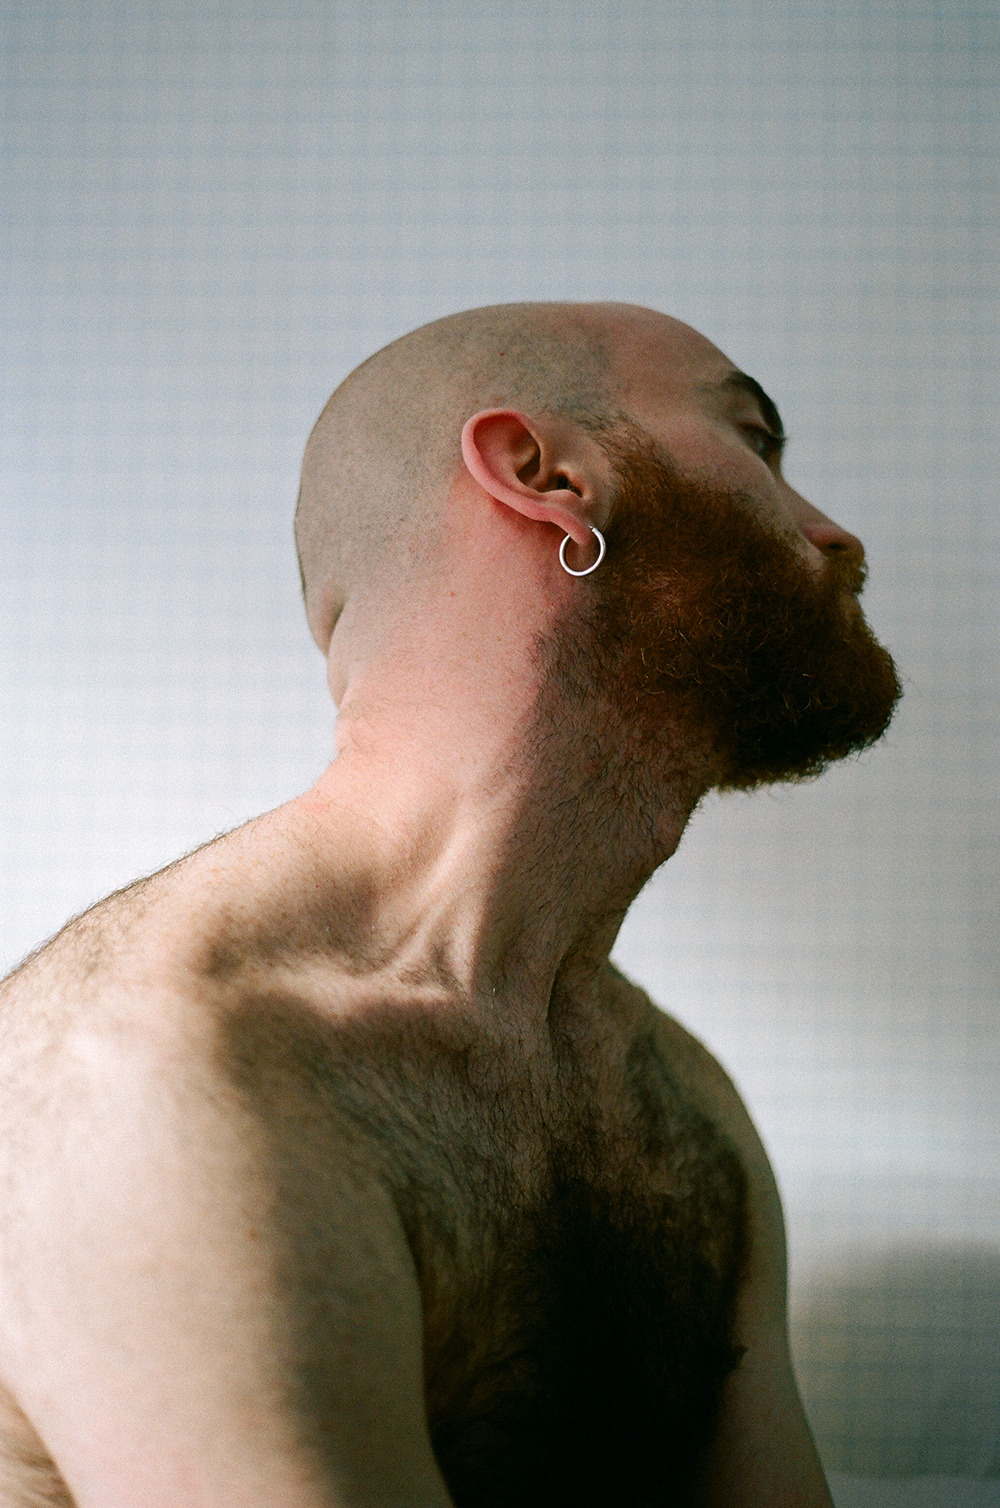 2018-06-04 05:21:09 - jordibartalot neck study beardburnme http://www.neofic.com